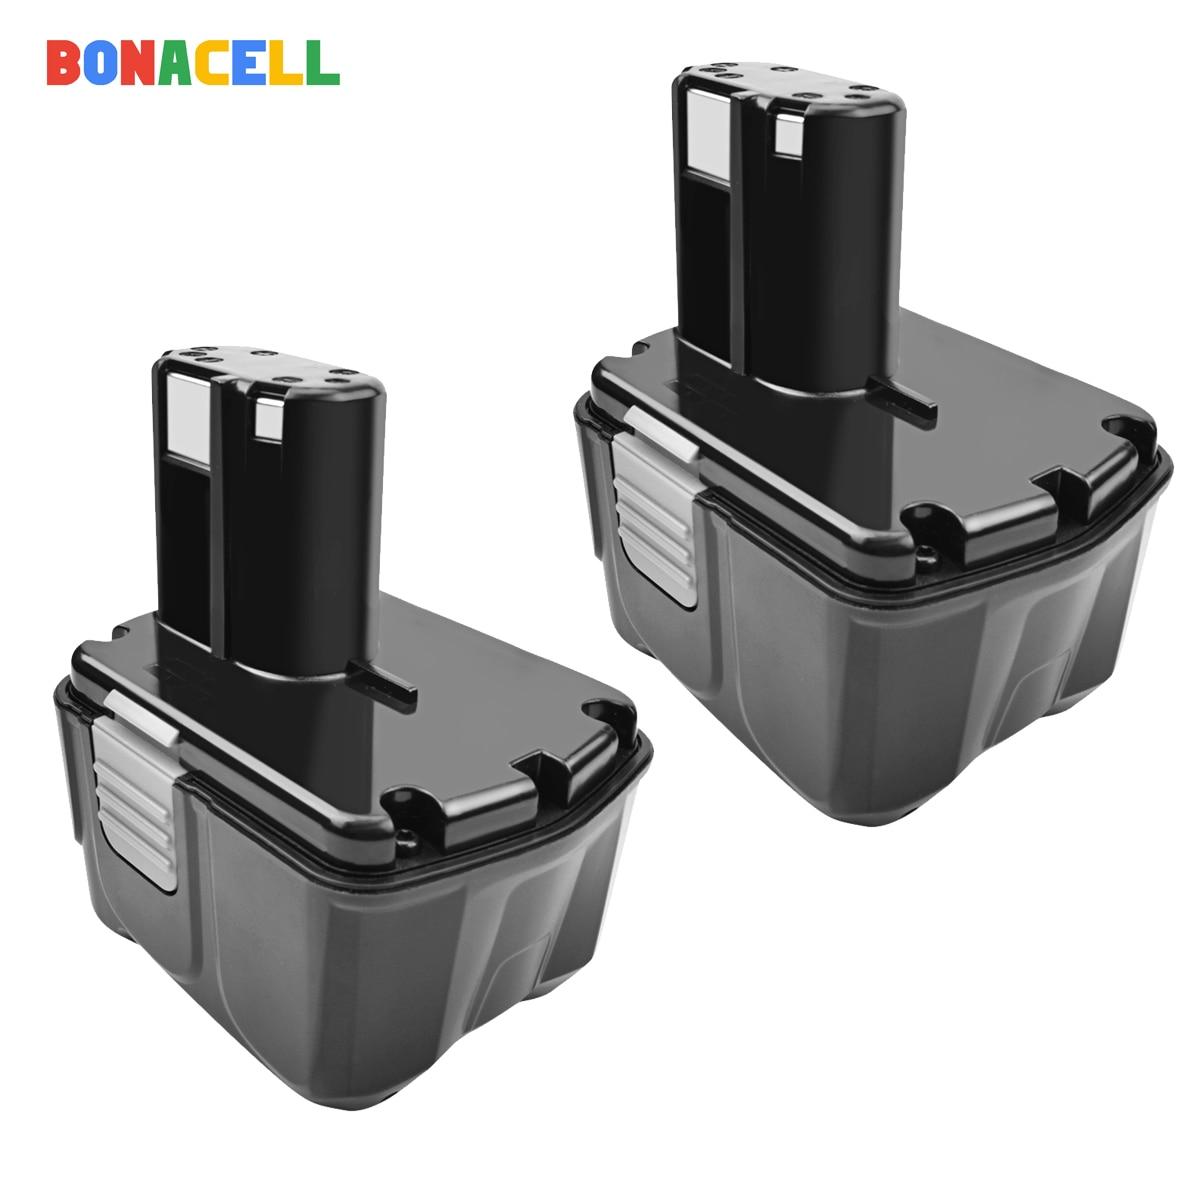 Bonacell для Hitachi BCL1430 14,4 V 3000mAh литий-ионный аккумулятор для Hitachi CJ14DL DH14DL EBL1430 BCL1430 BCL1415